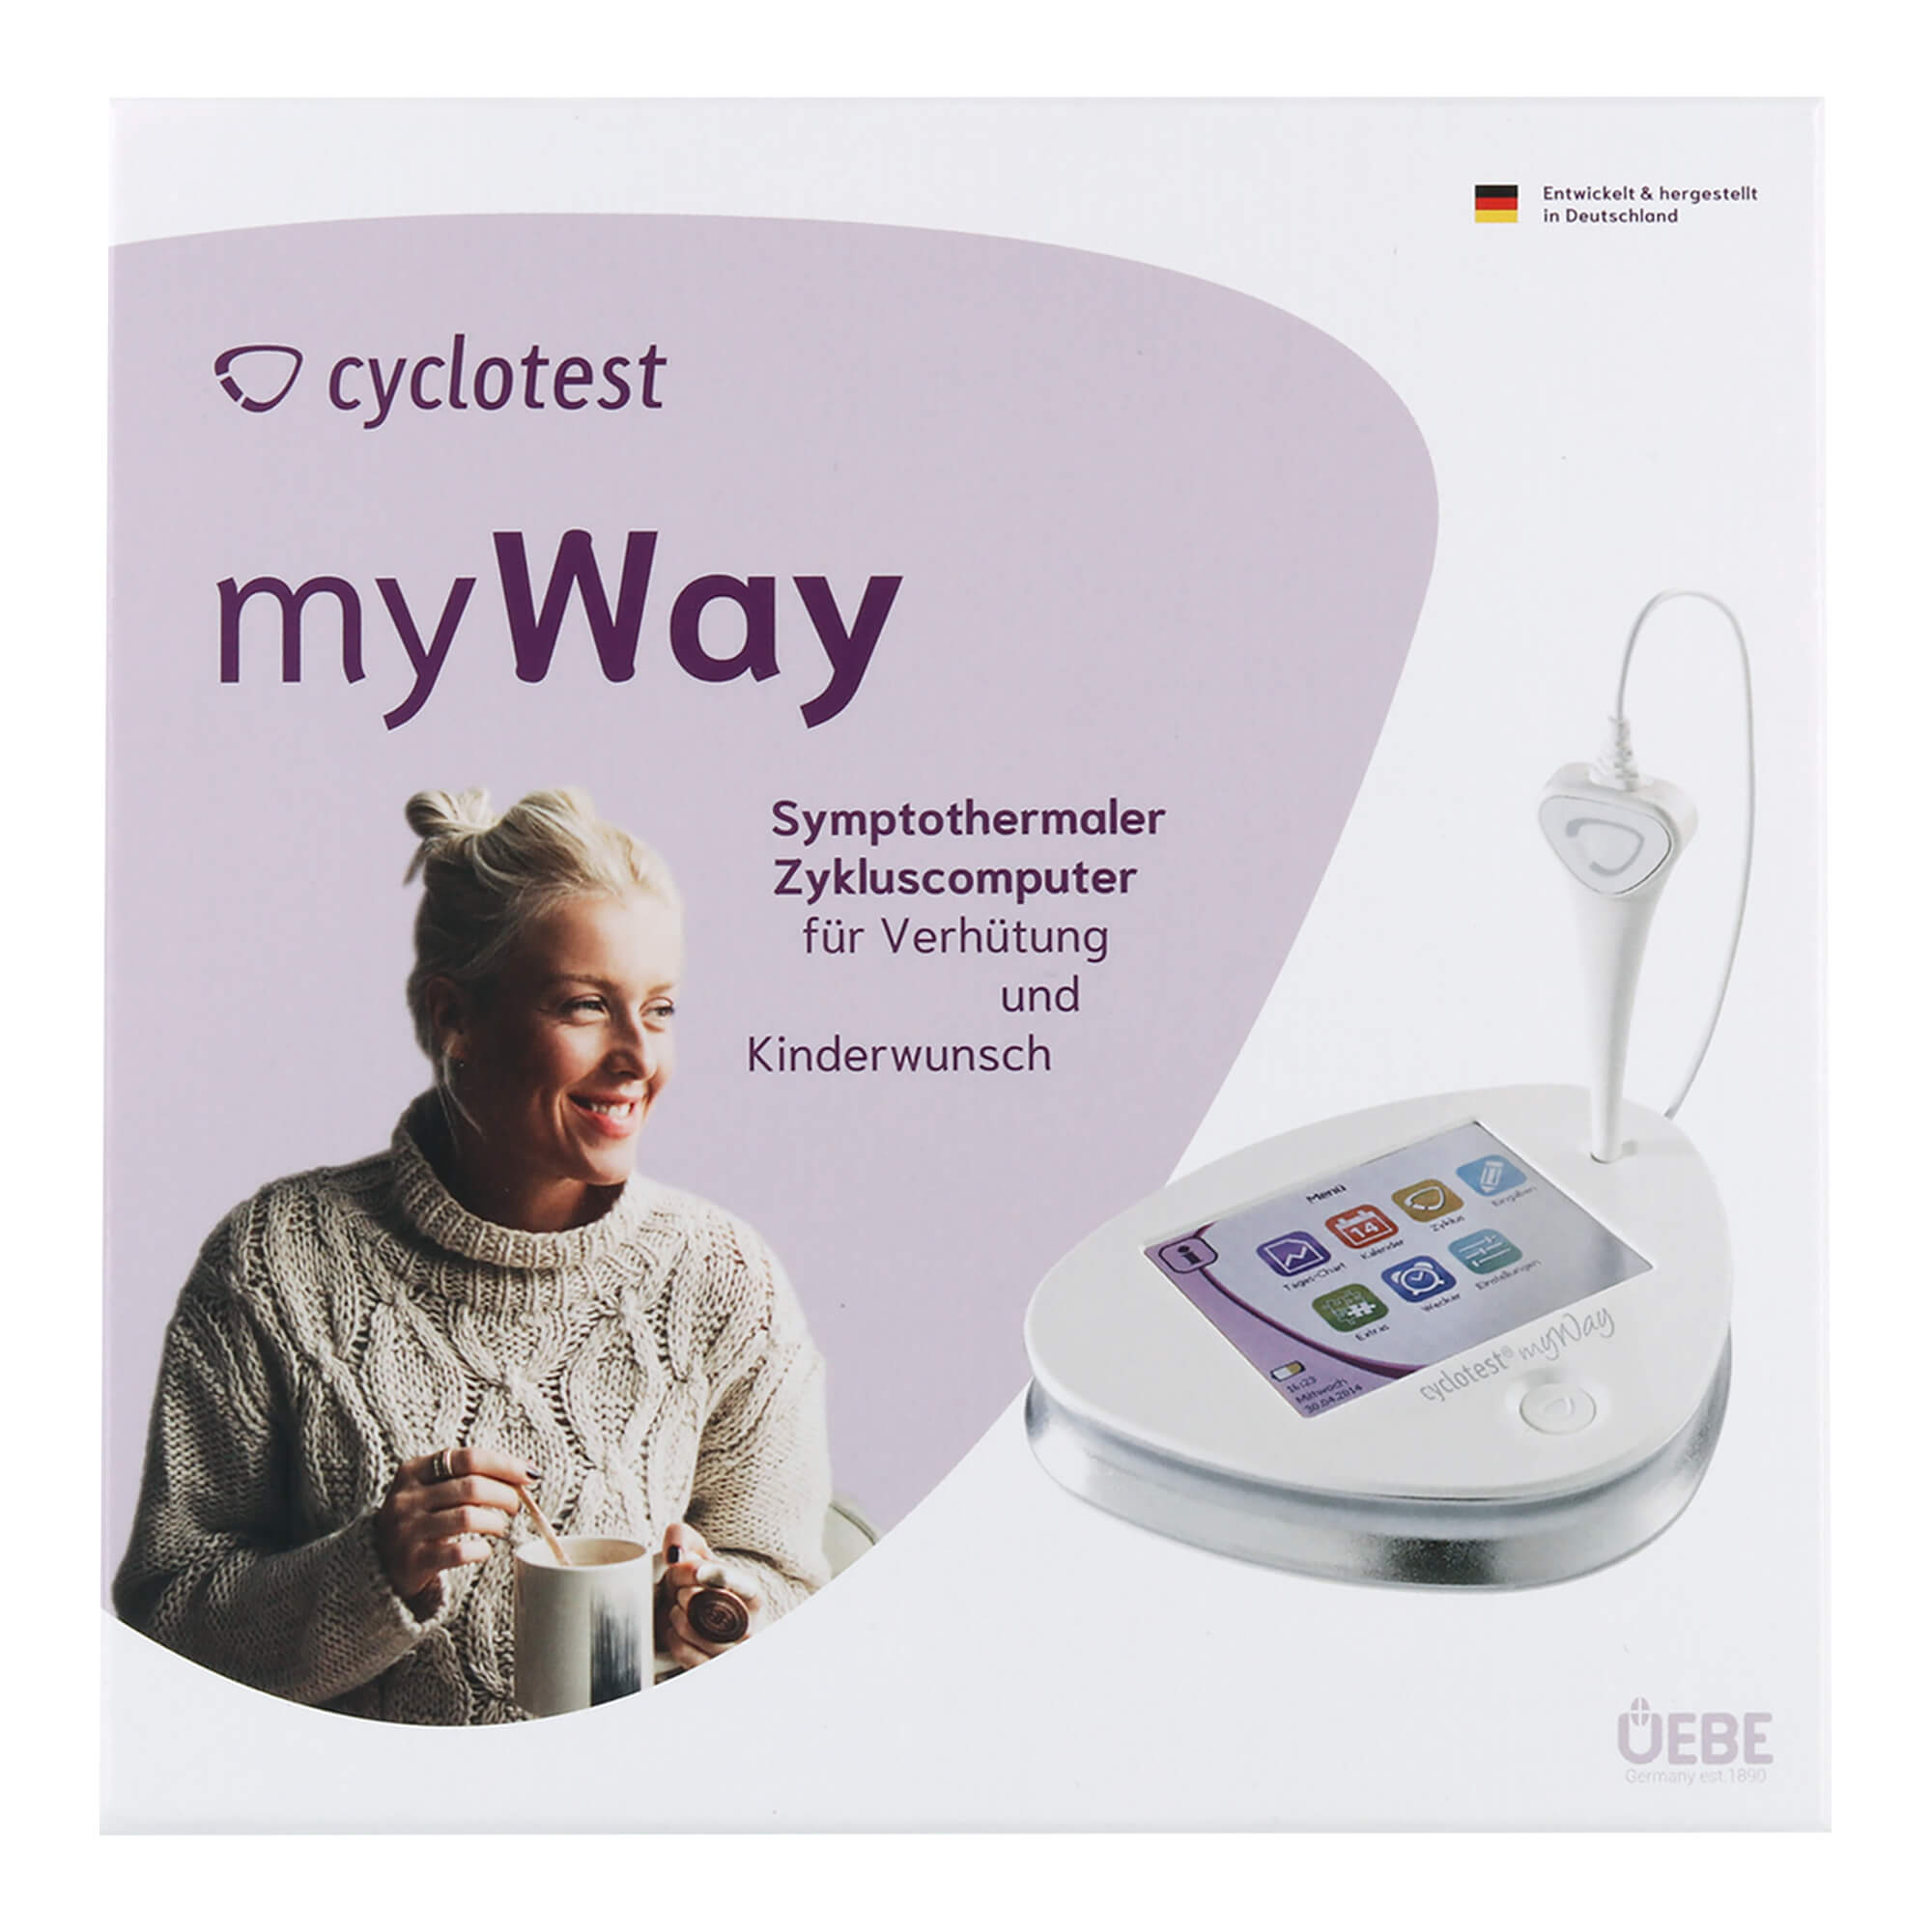 cyclotest myWay Zykluscomputer